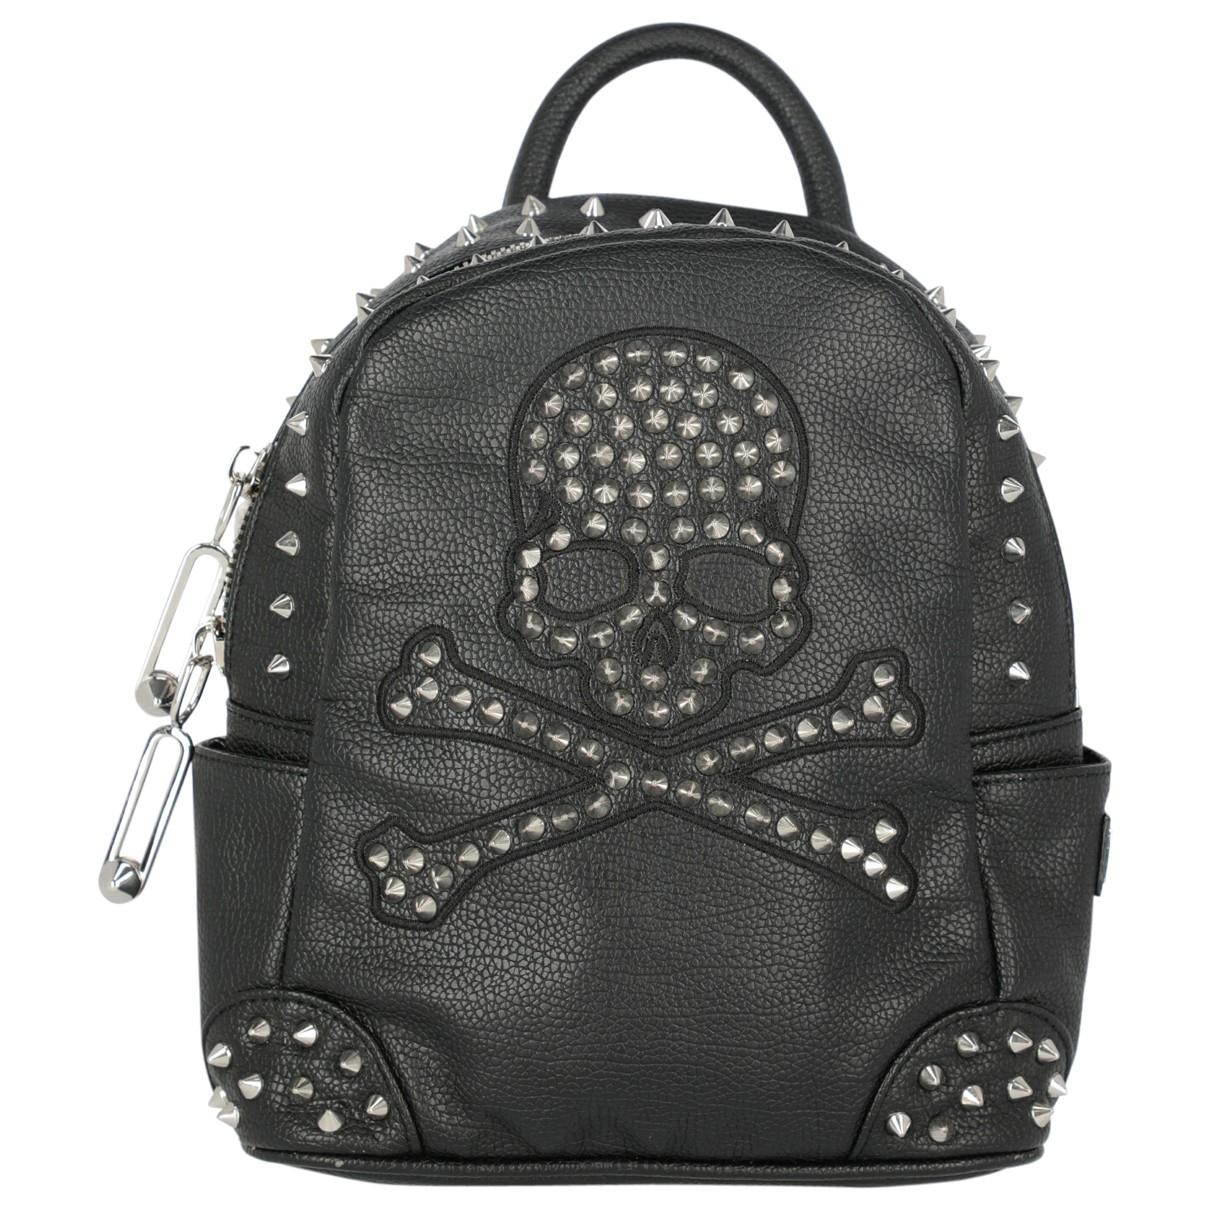 Philipp Plein \N Black Leather backpack for Women \N